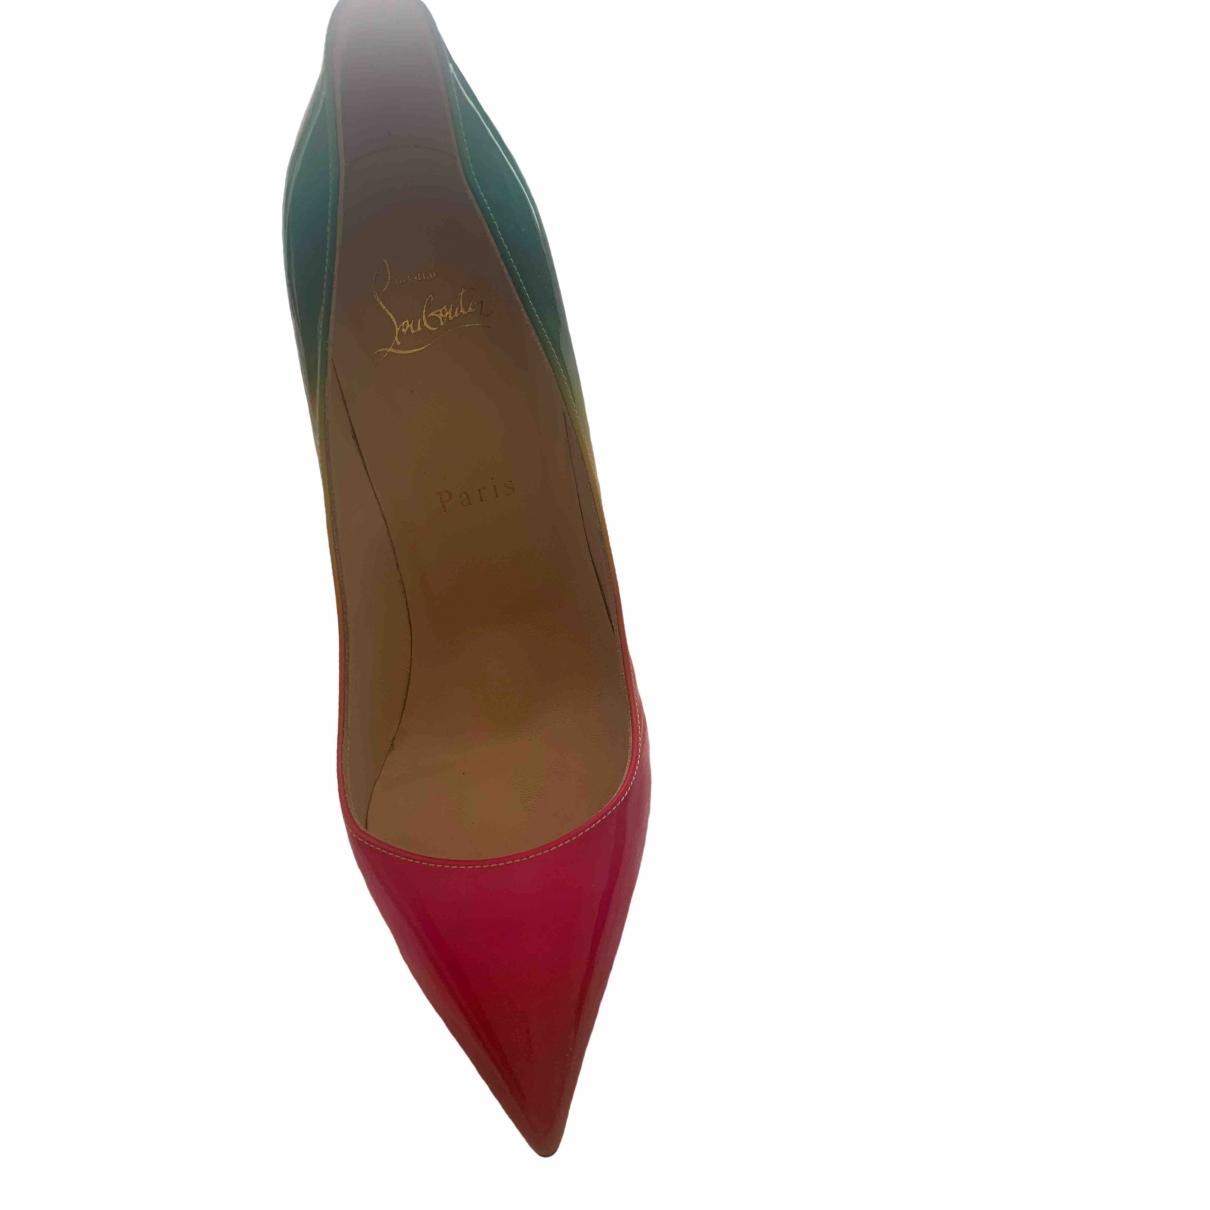 Christian Louboutin Pigalle Multicolour Patent leather Heels for Women 38.5 EU